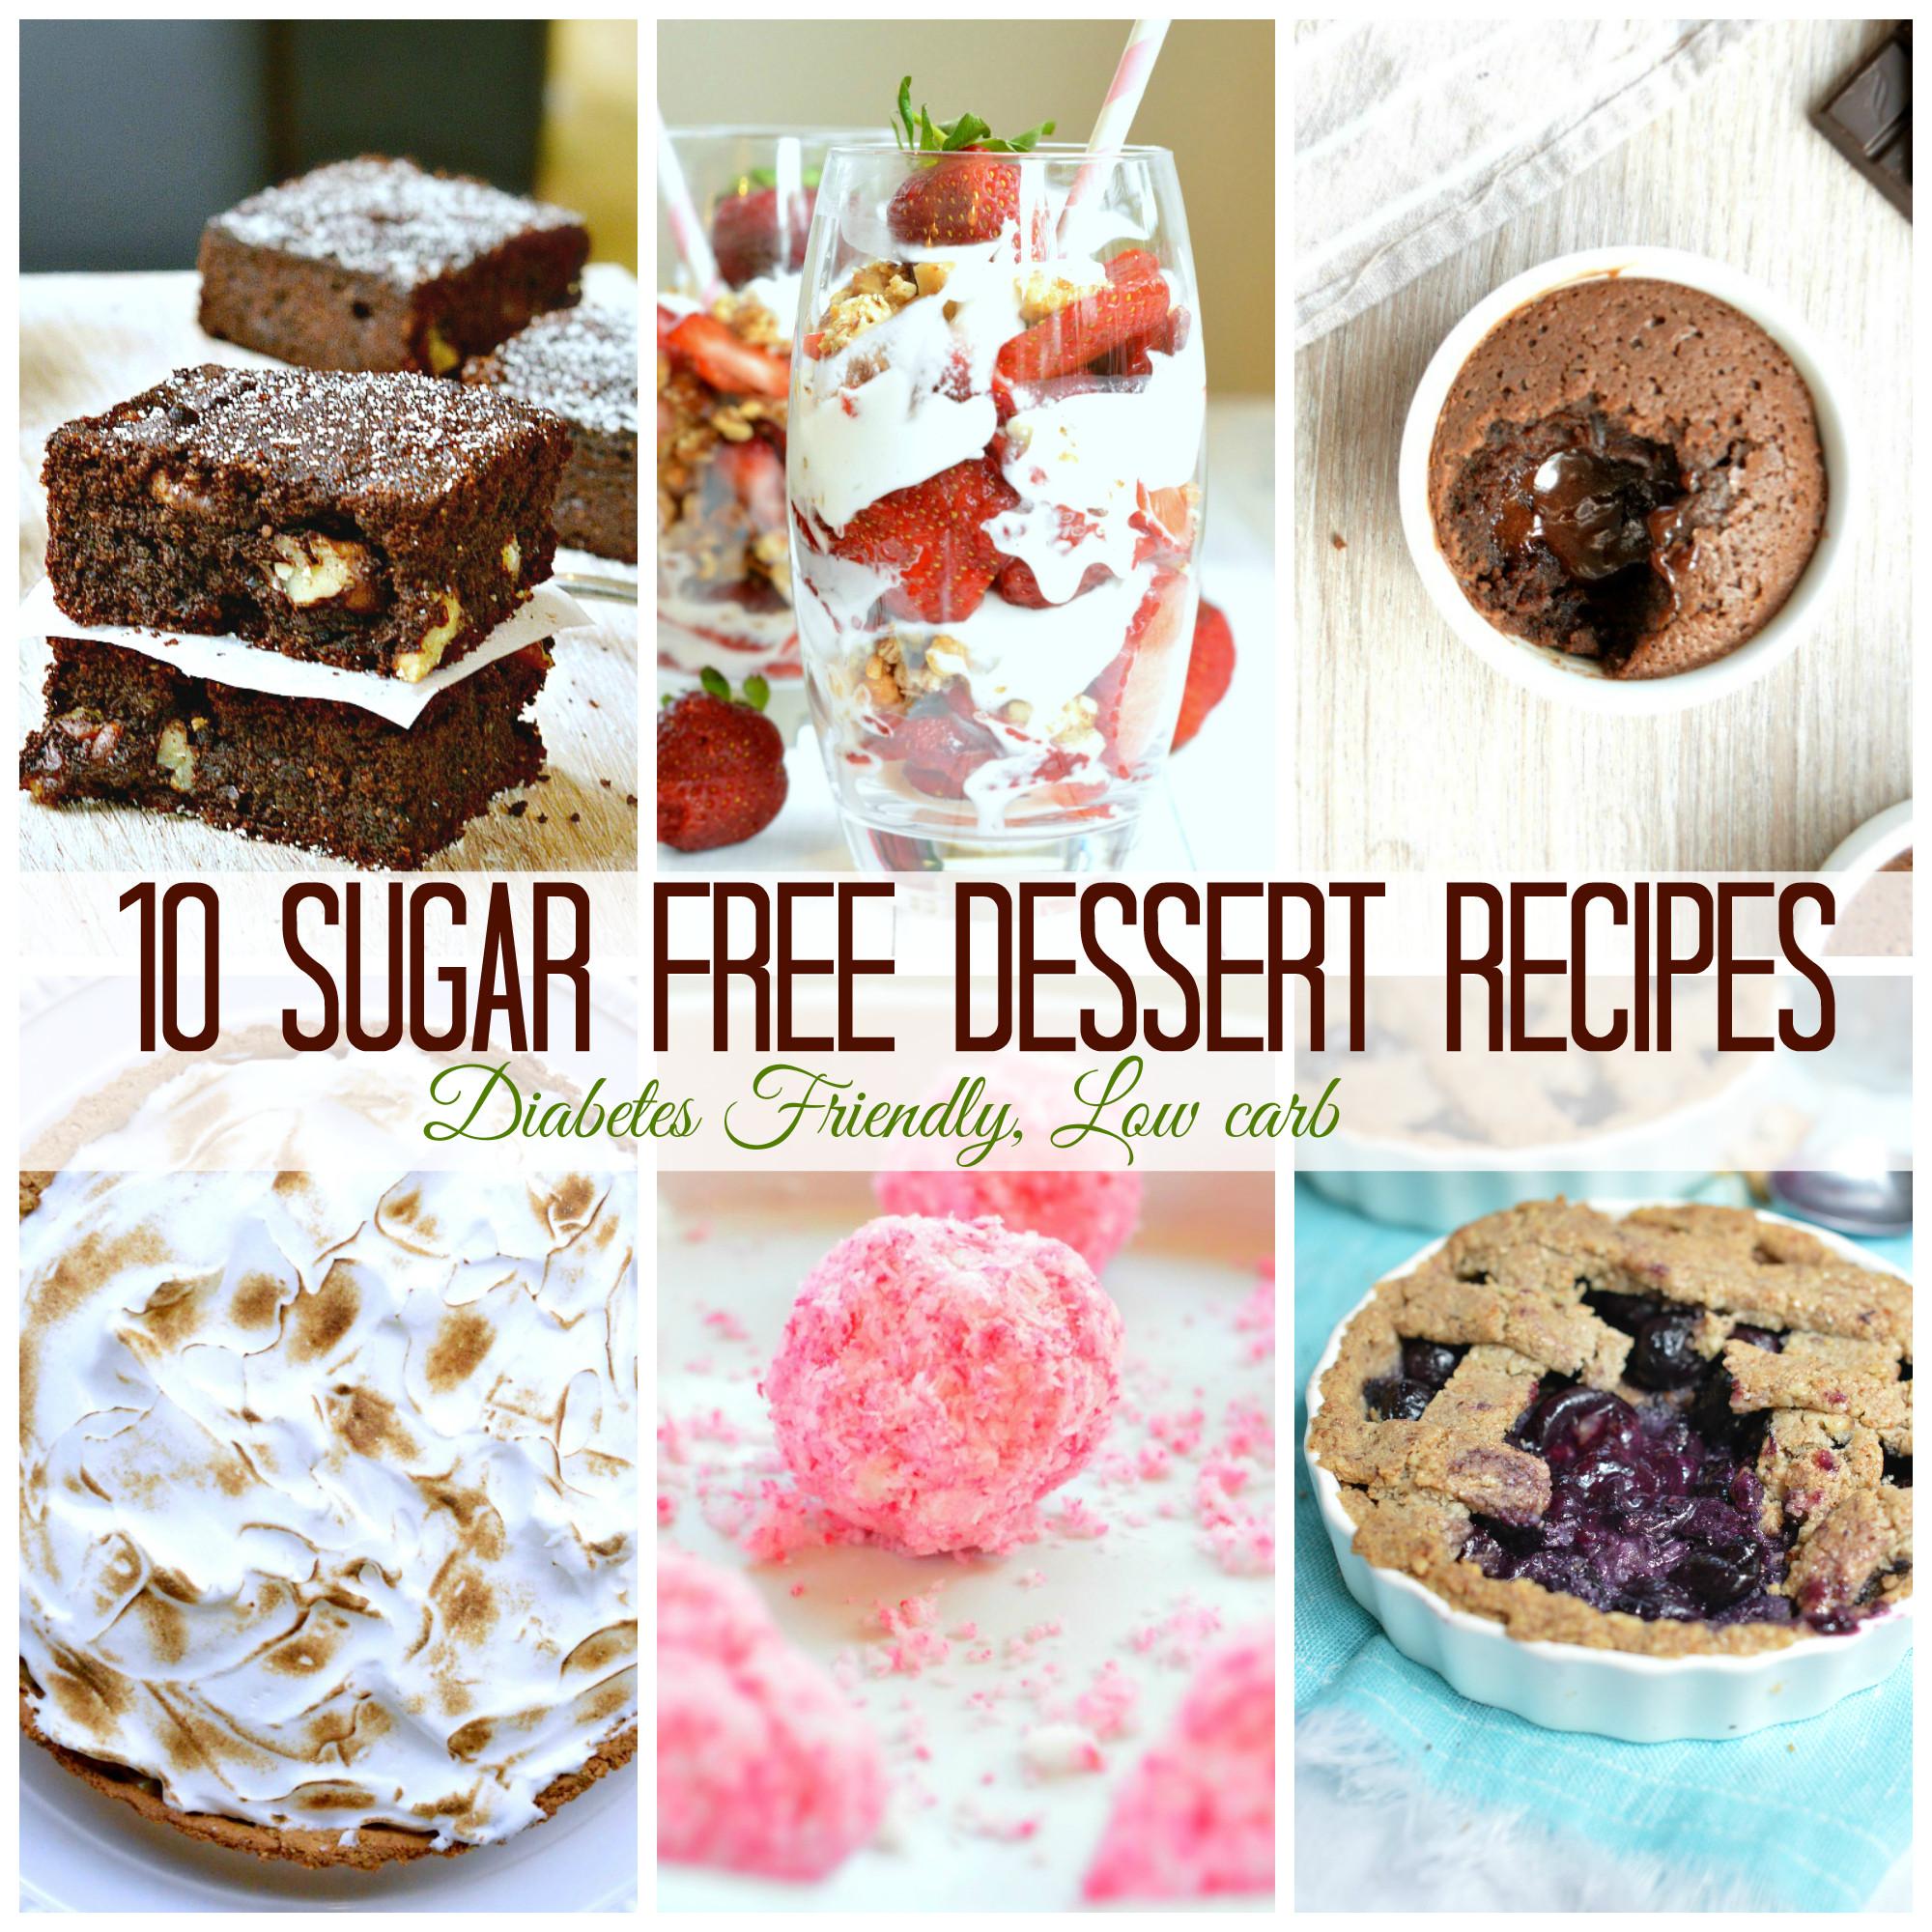 Good Desserts For Diabetics  10 Sugar Free Dessert for diabetics SWEETASHONEY